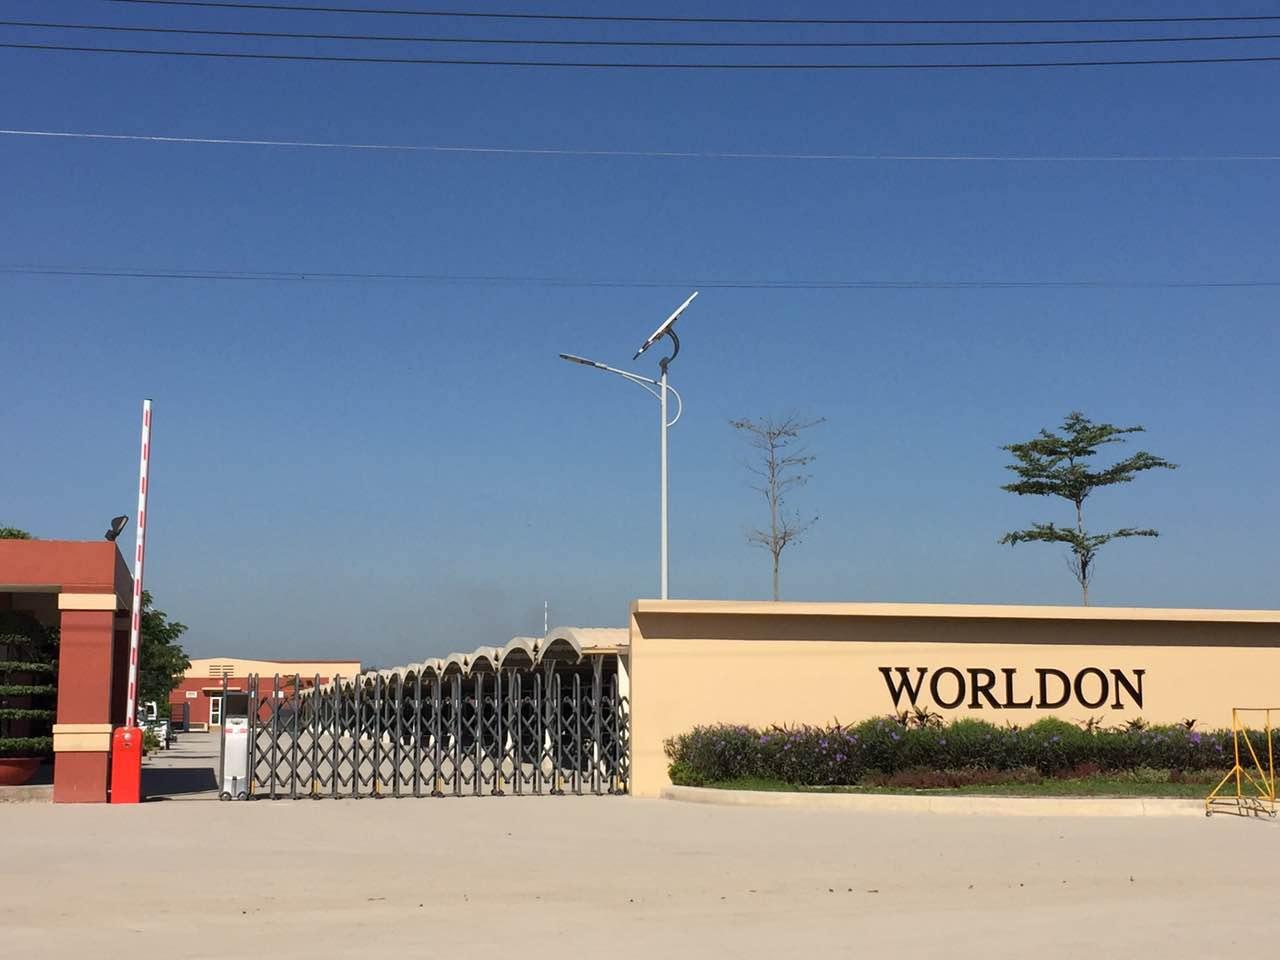 Worldon 03